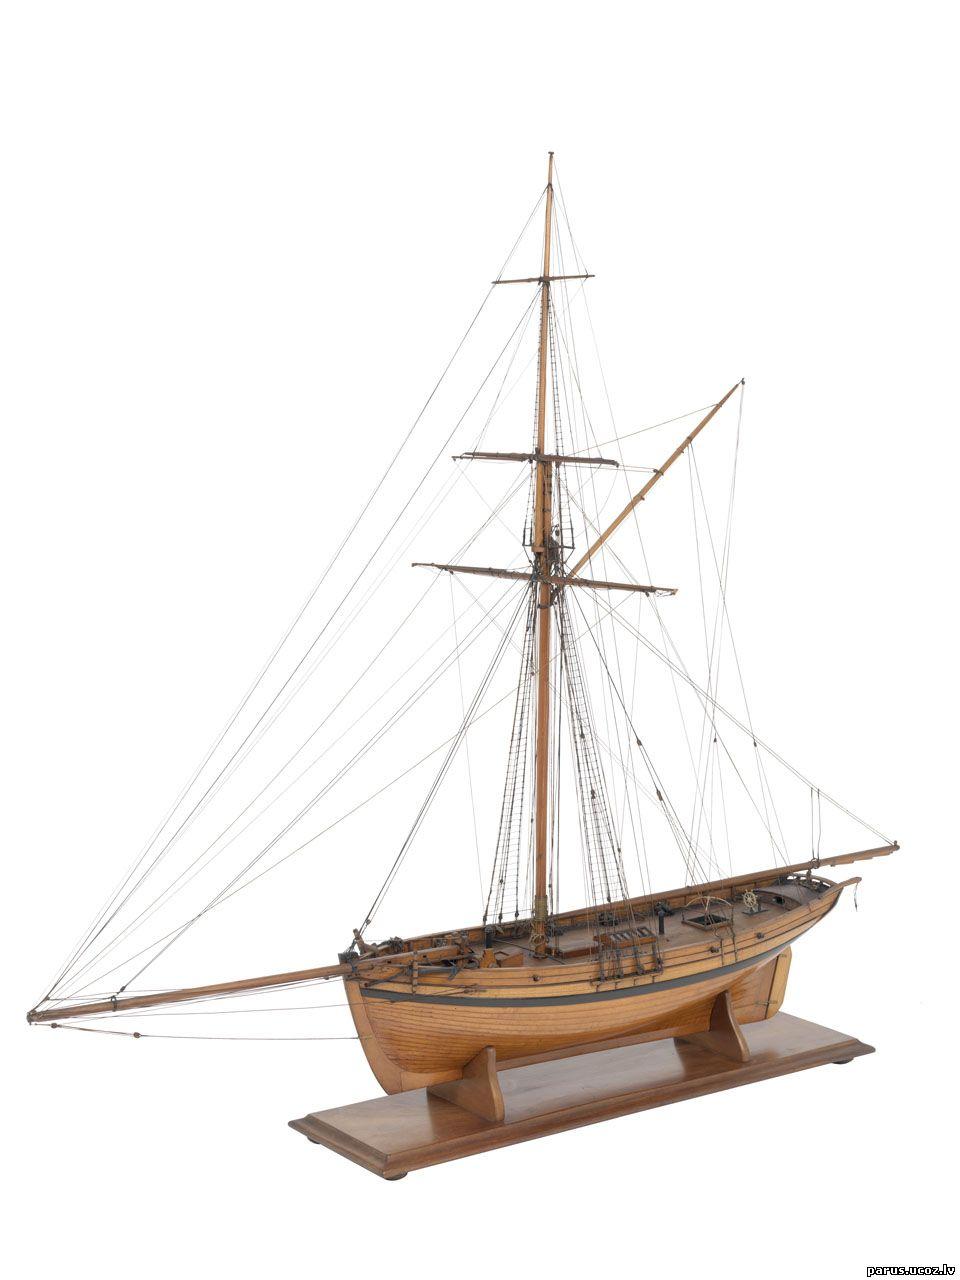 продам кораблик для прикормки на олх